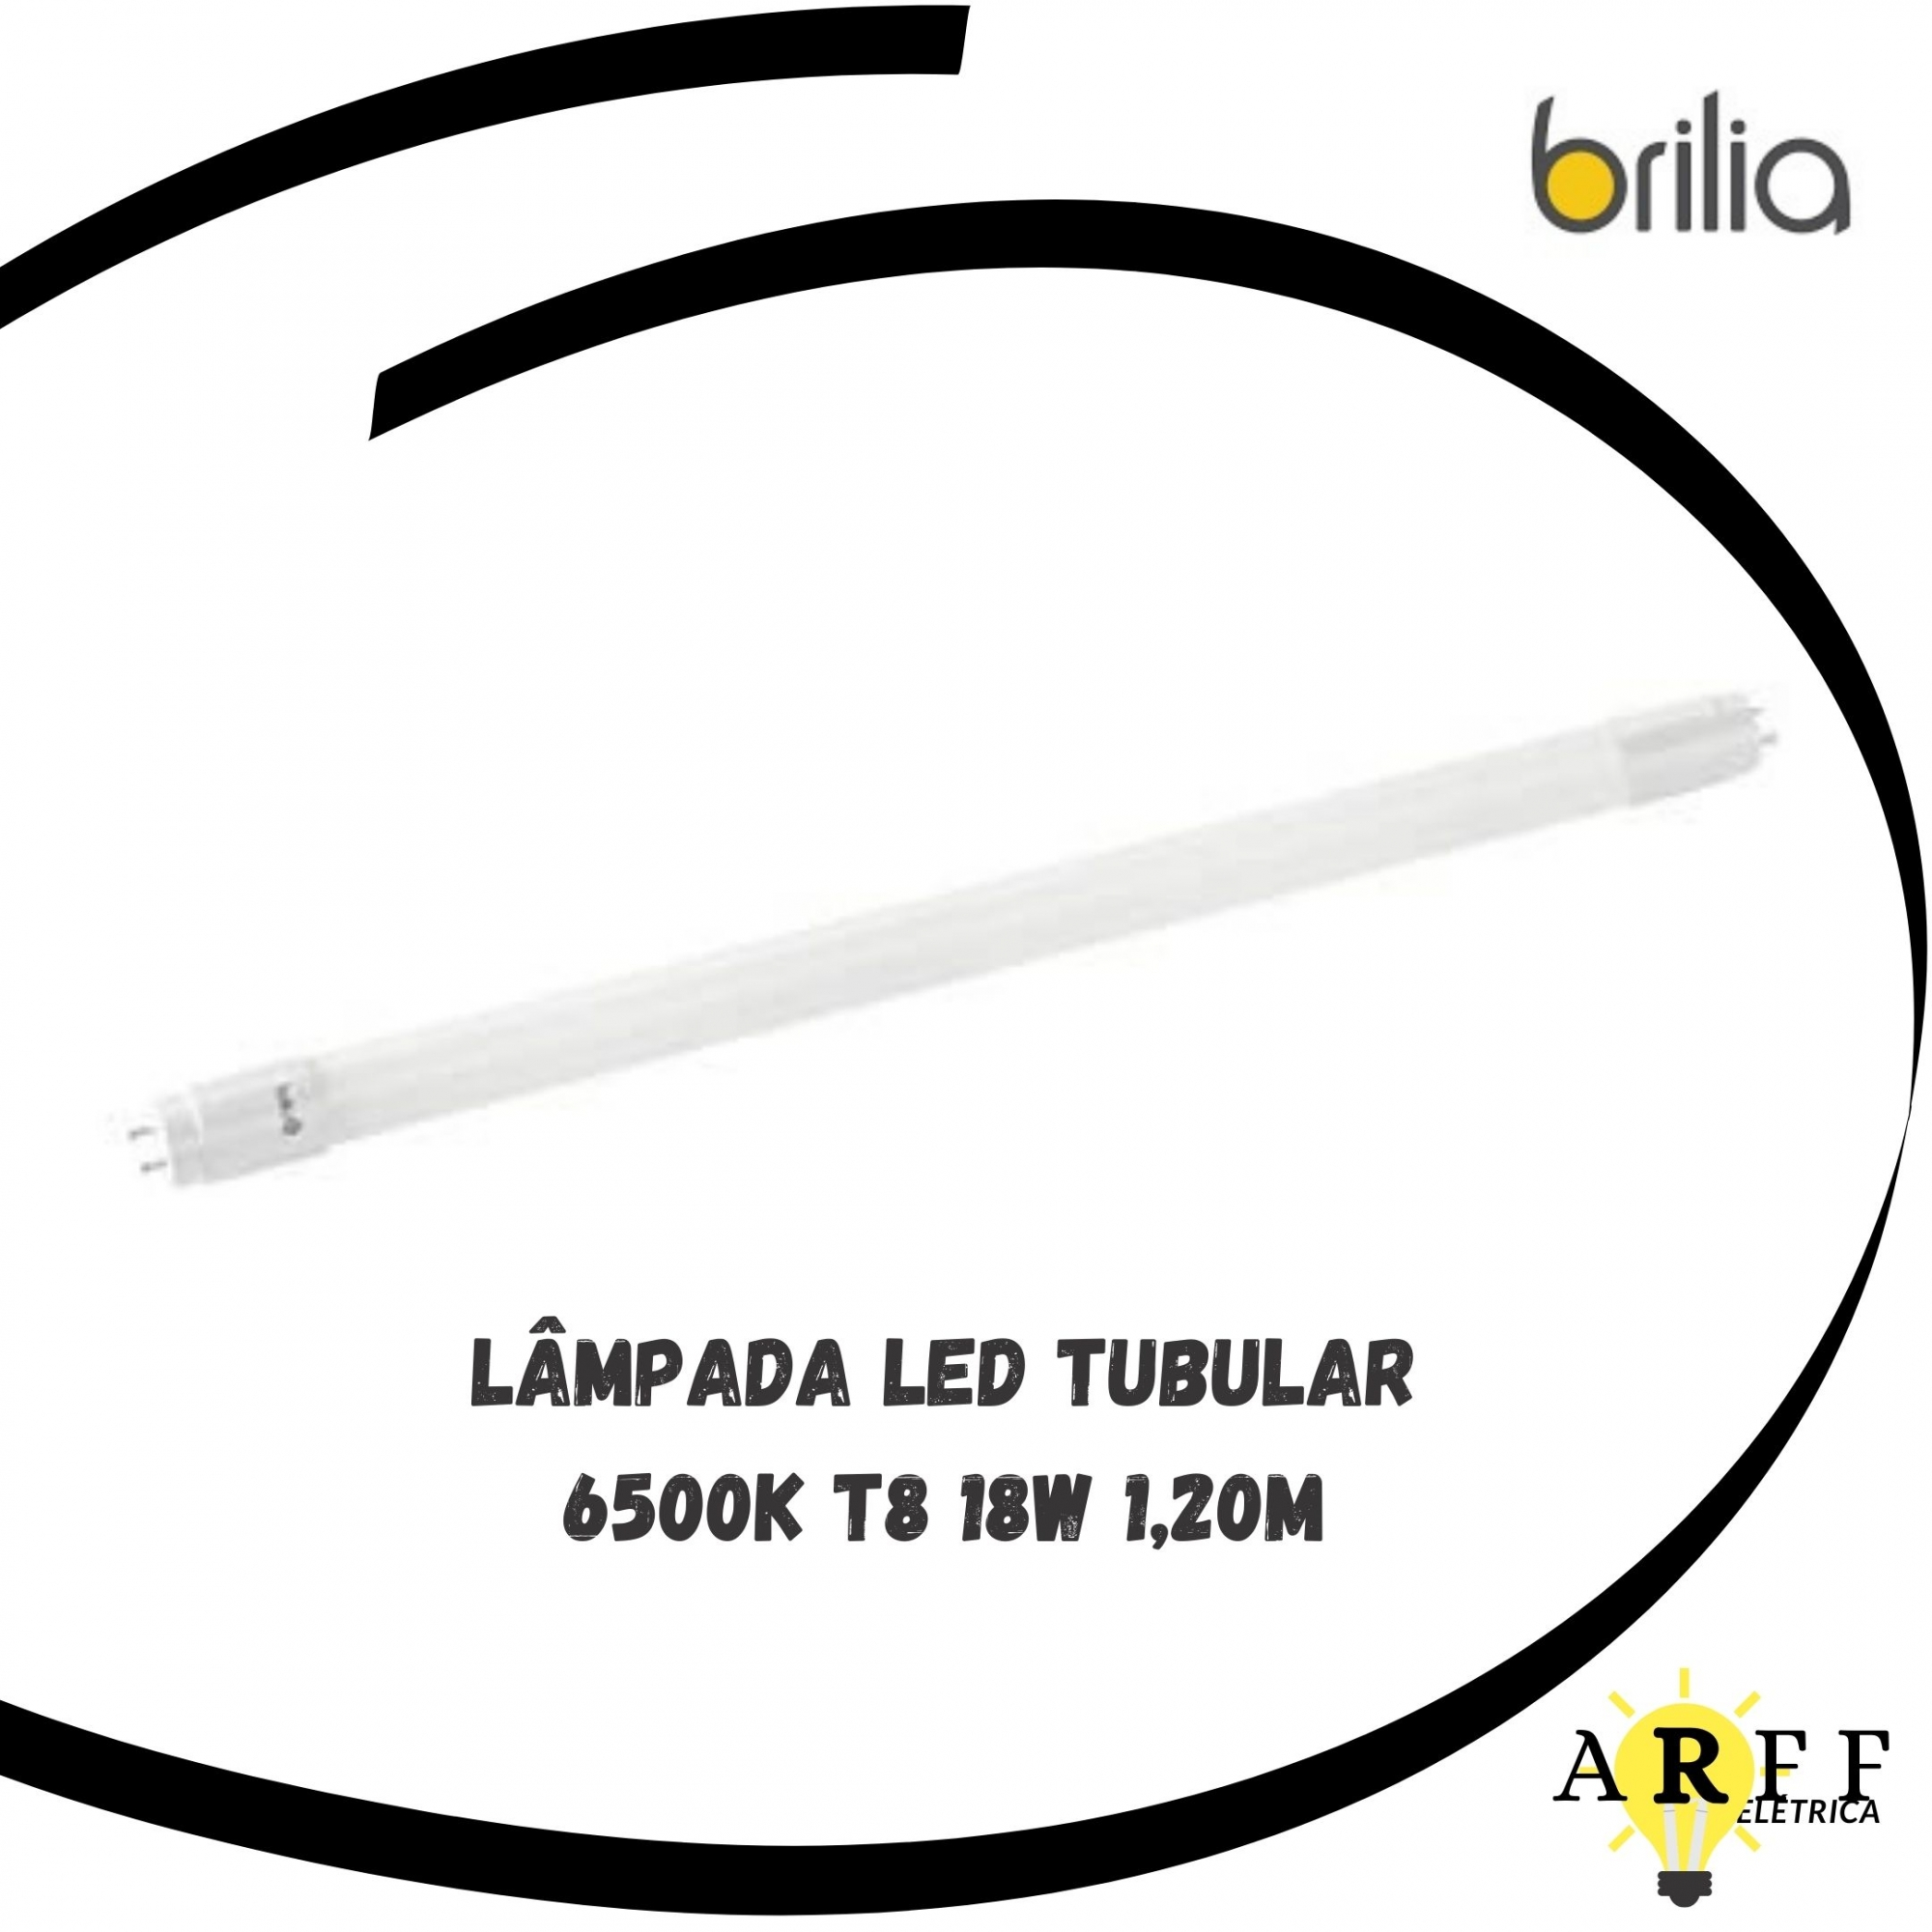 Lâmpada Tubular LED T8 6500K 18W 1,20m BRILIA